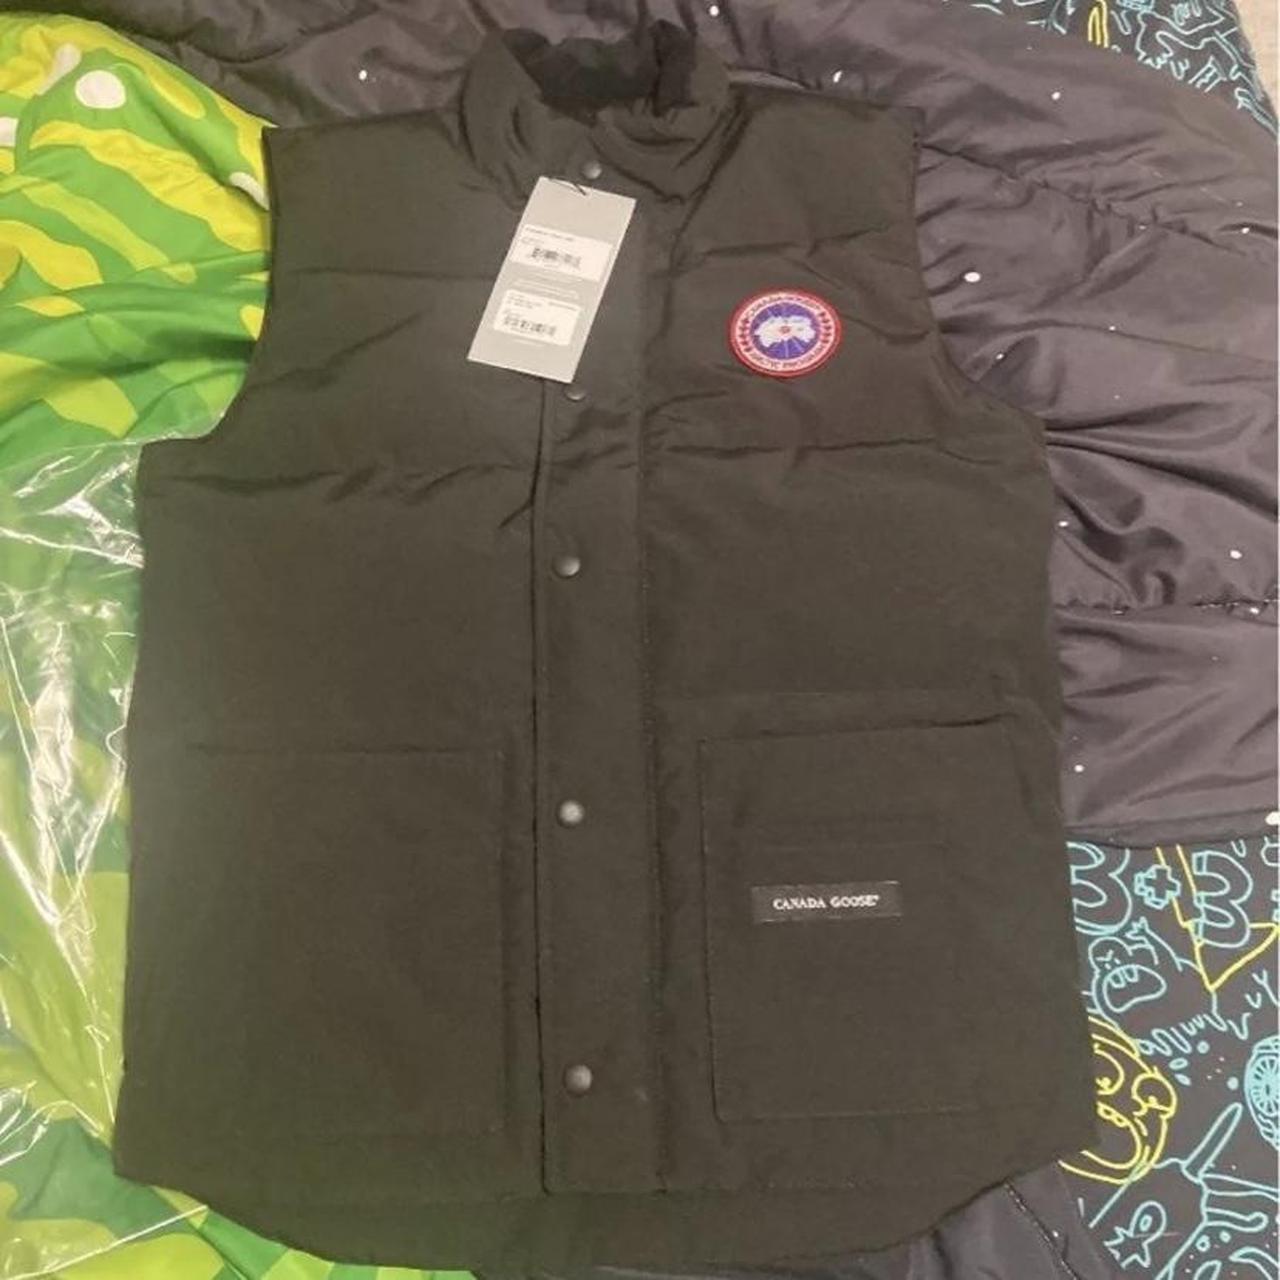 Product Image 1 - Canada goode gilet vest. Worn